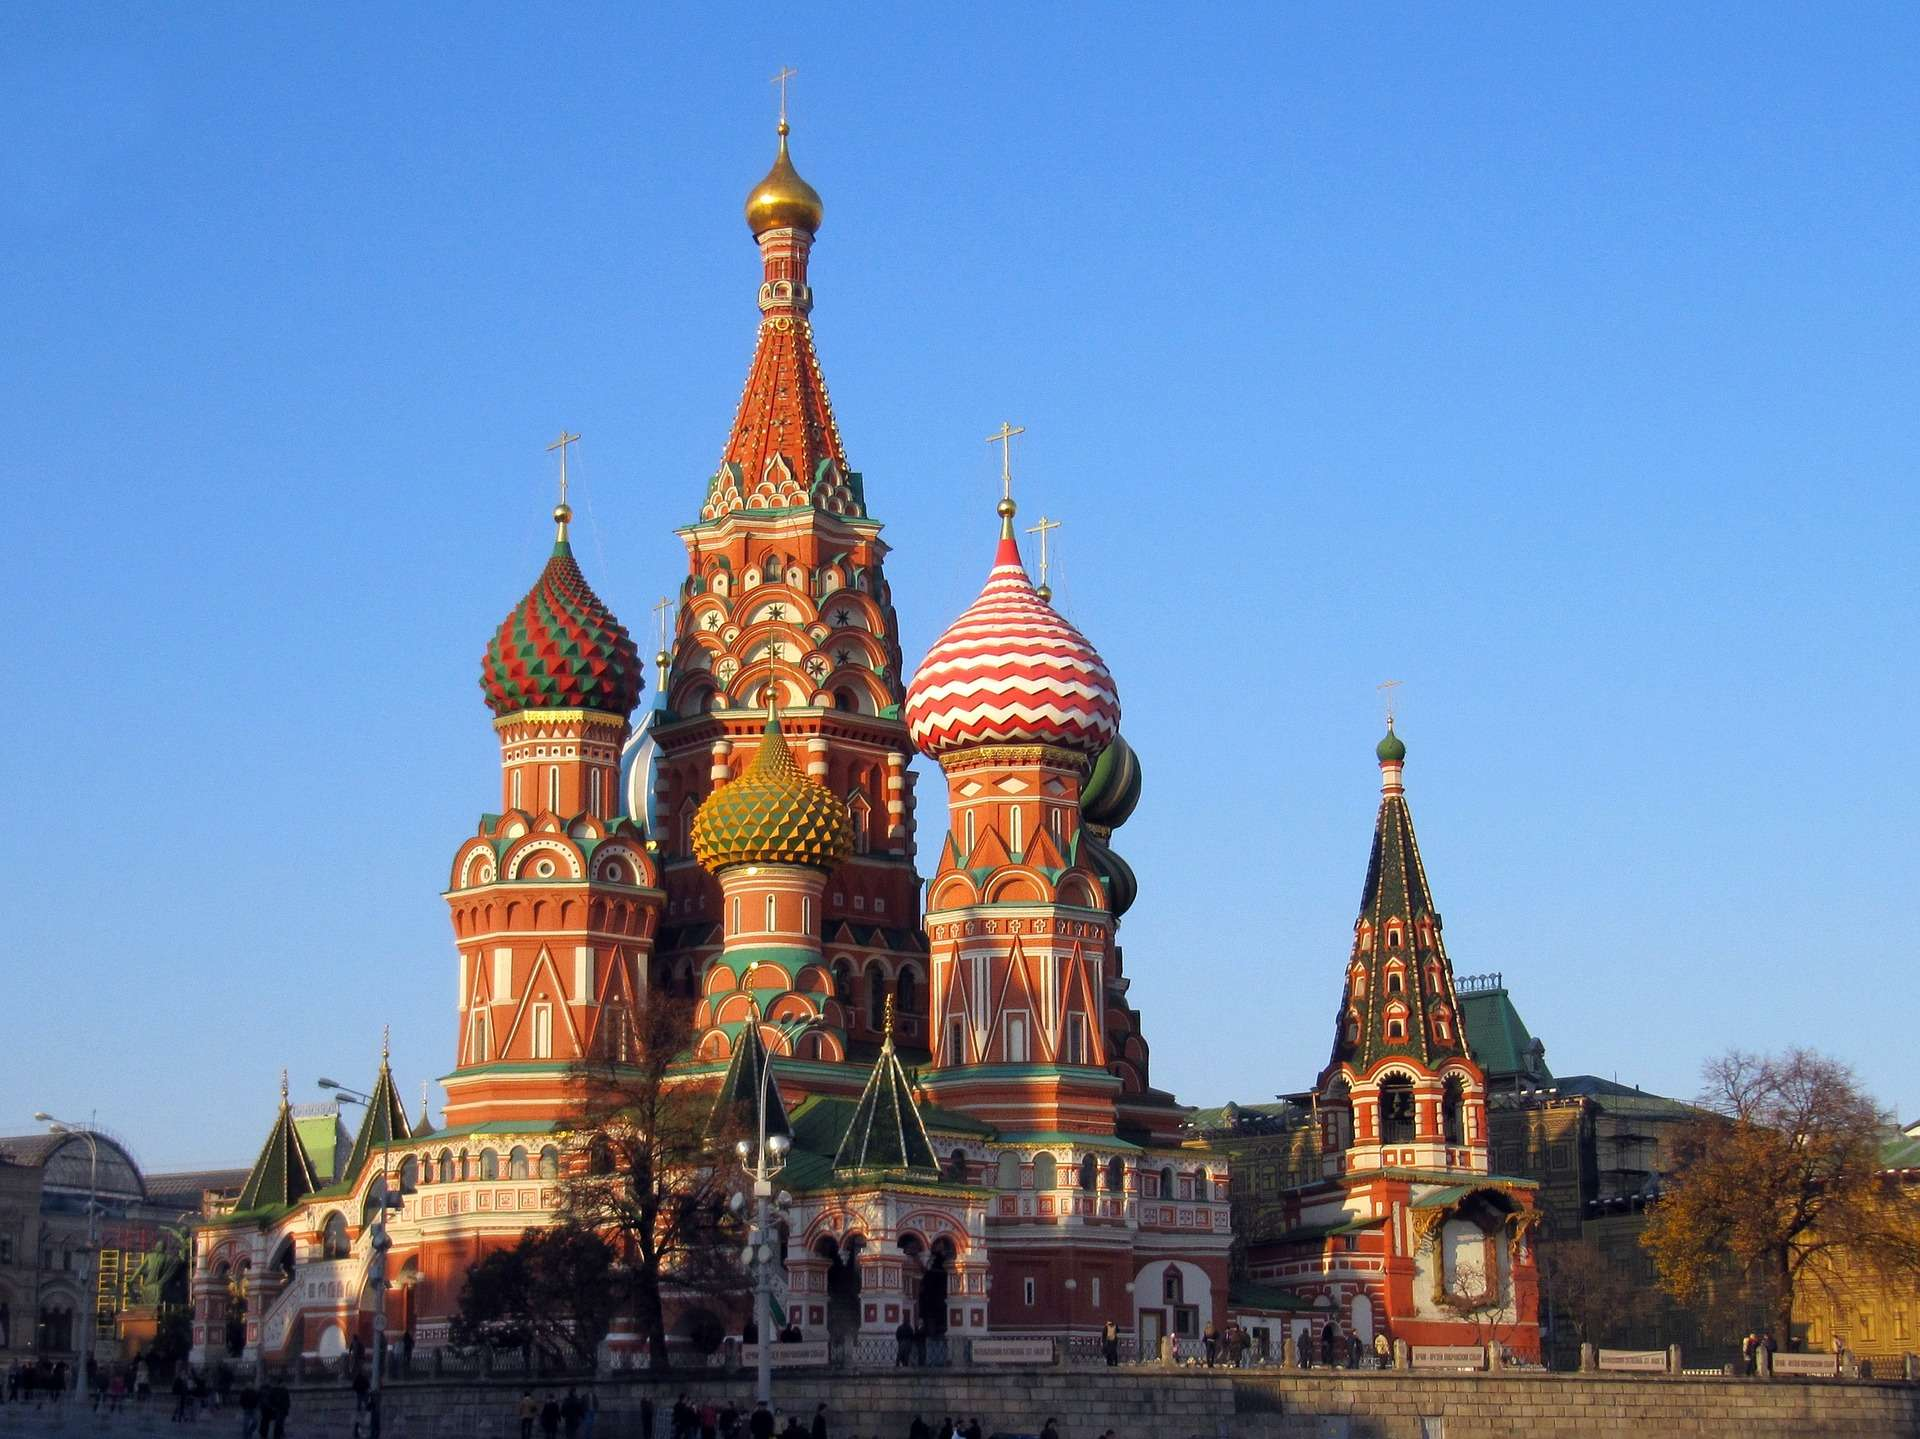 Direktflüge und Billigflüge ab Berlin-Tegel nach Moskau Domodedowo